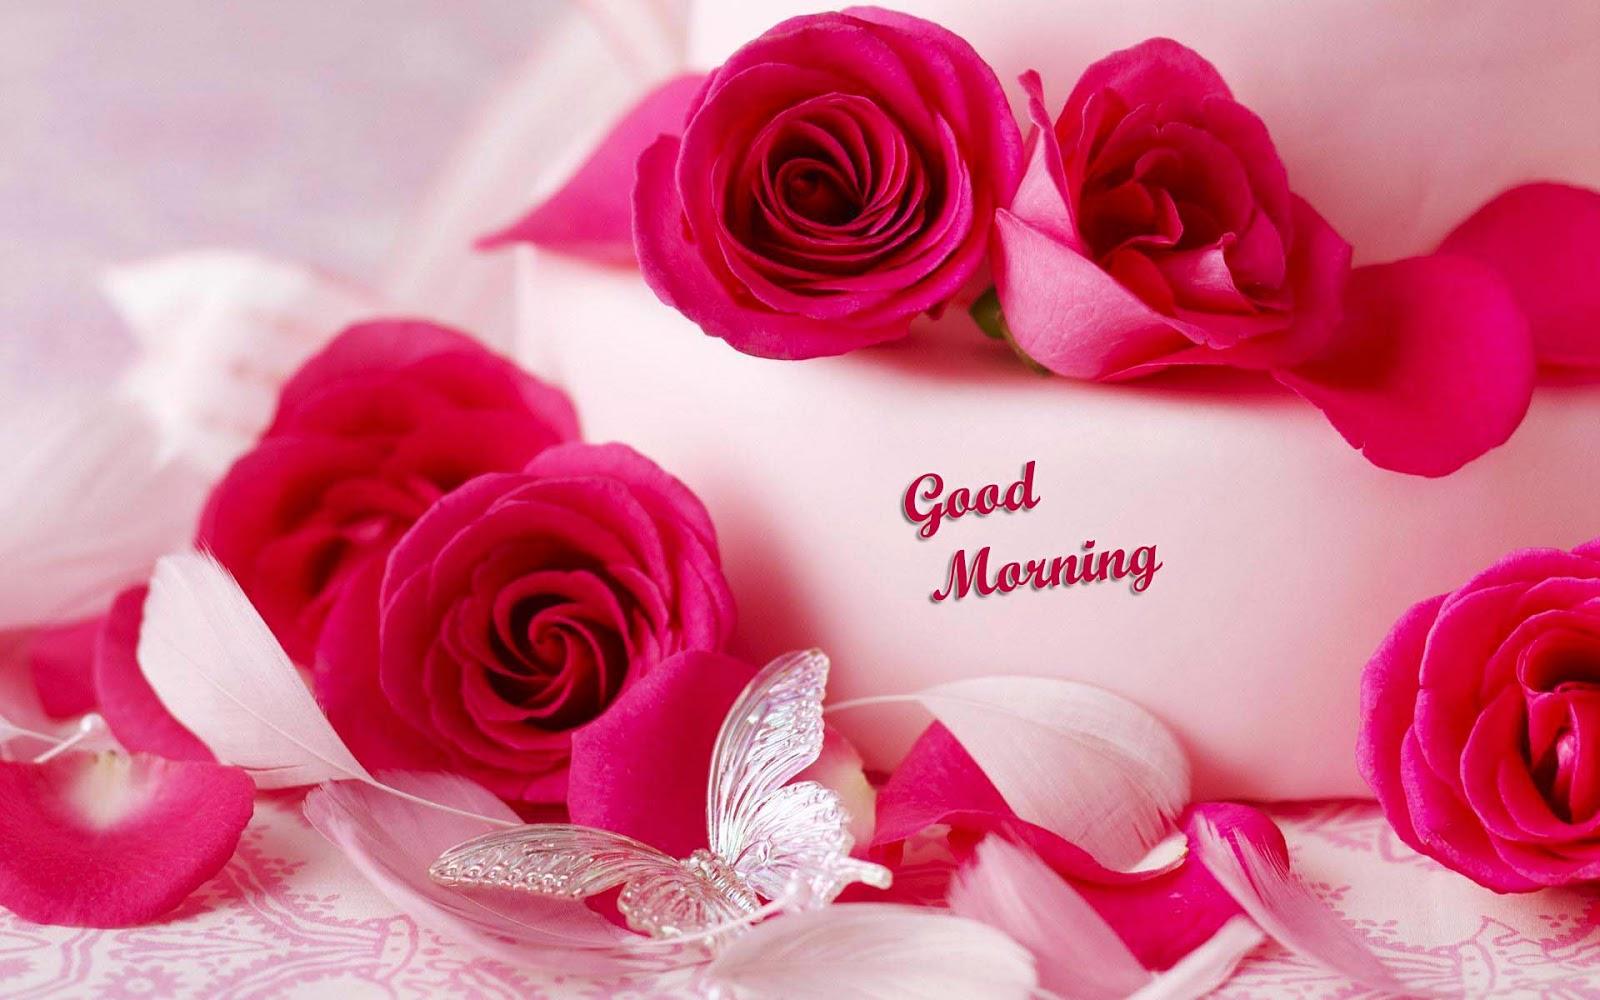 Good Morning Wallpaper Red Roses